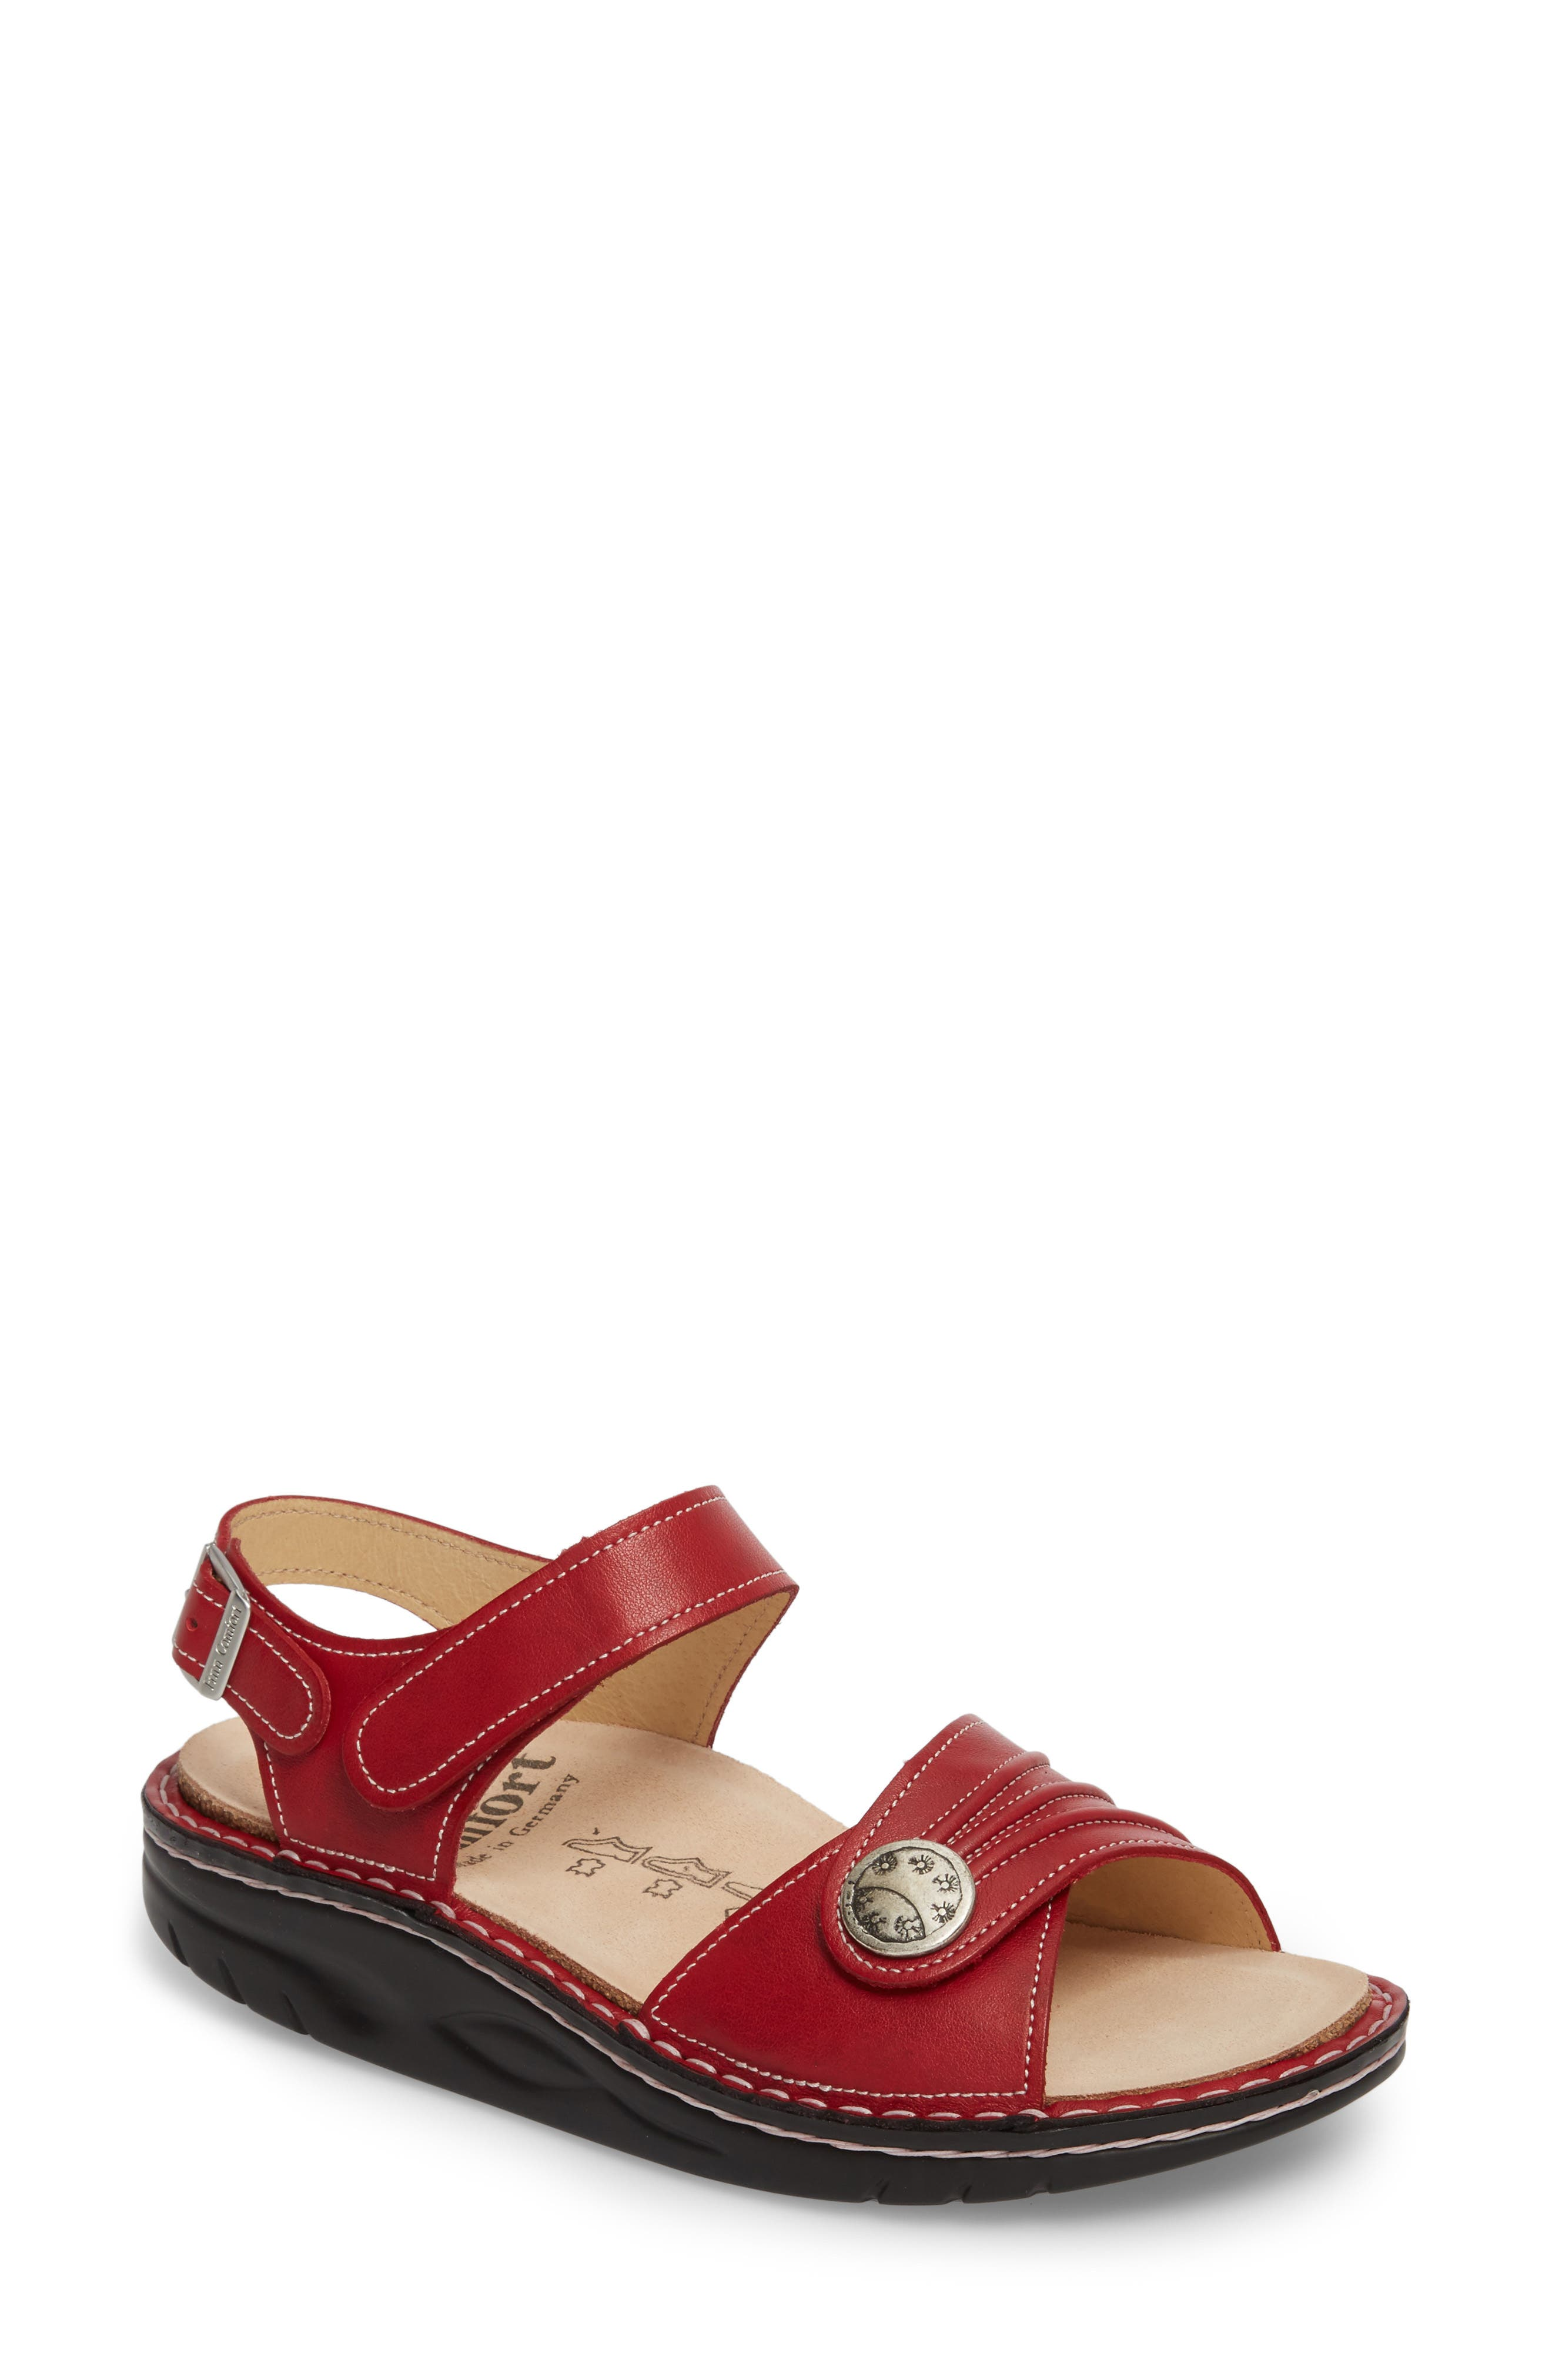 FINNAMIC by Finn Comfort 'Sausalito' Sandal (Online Only)